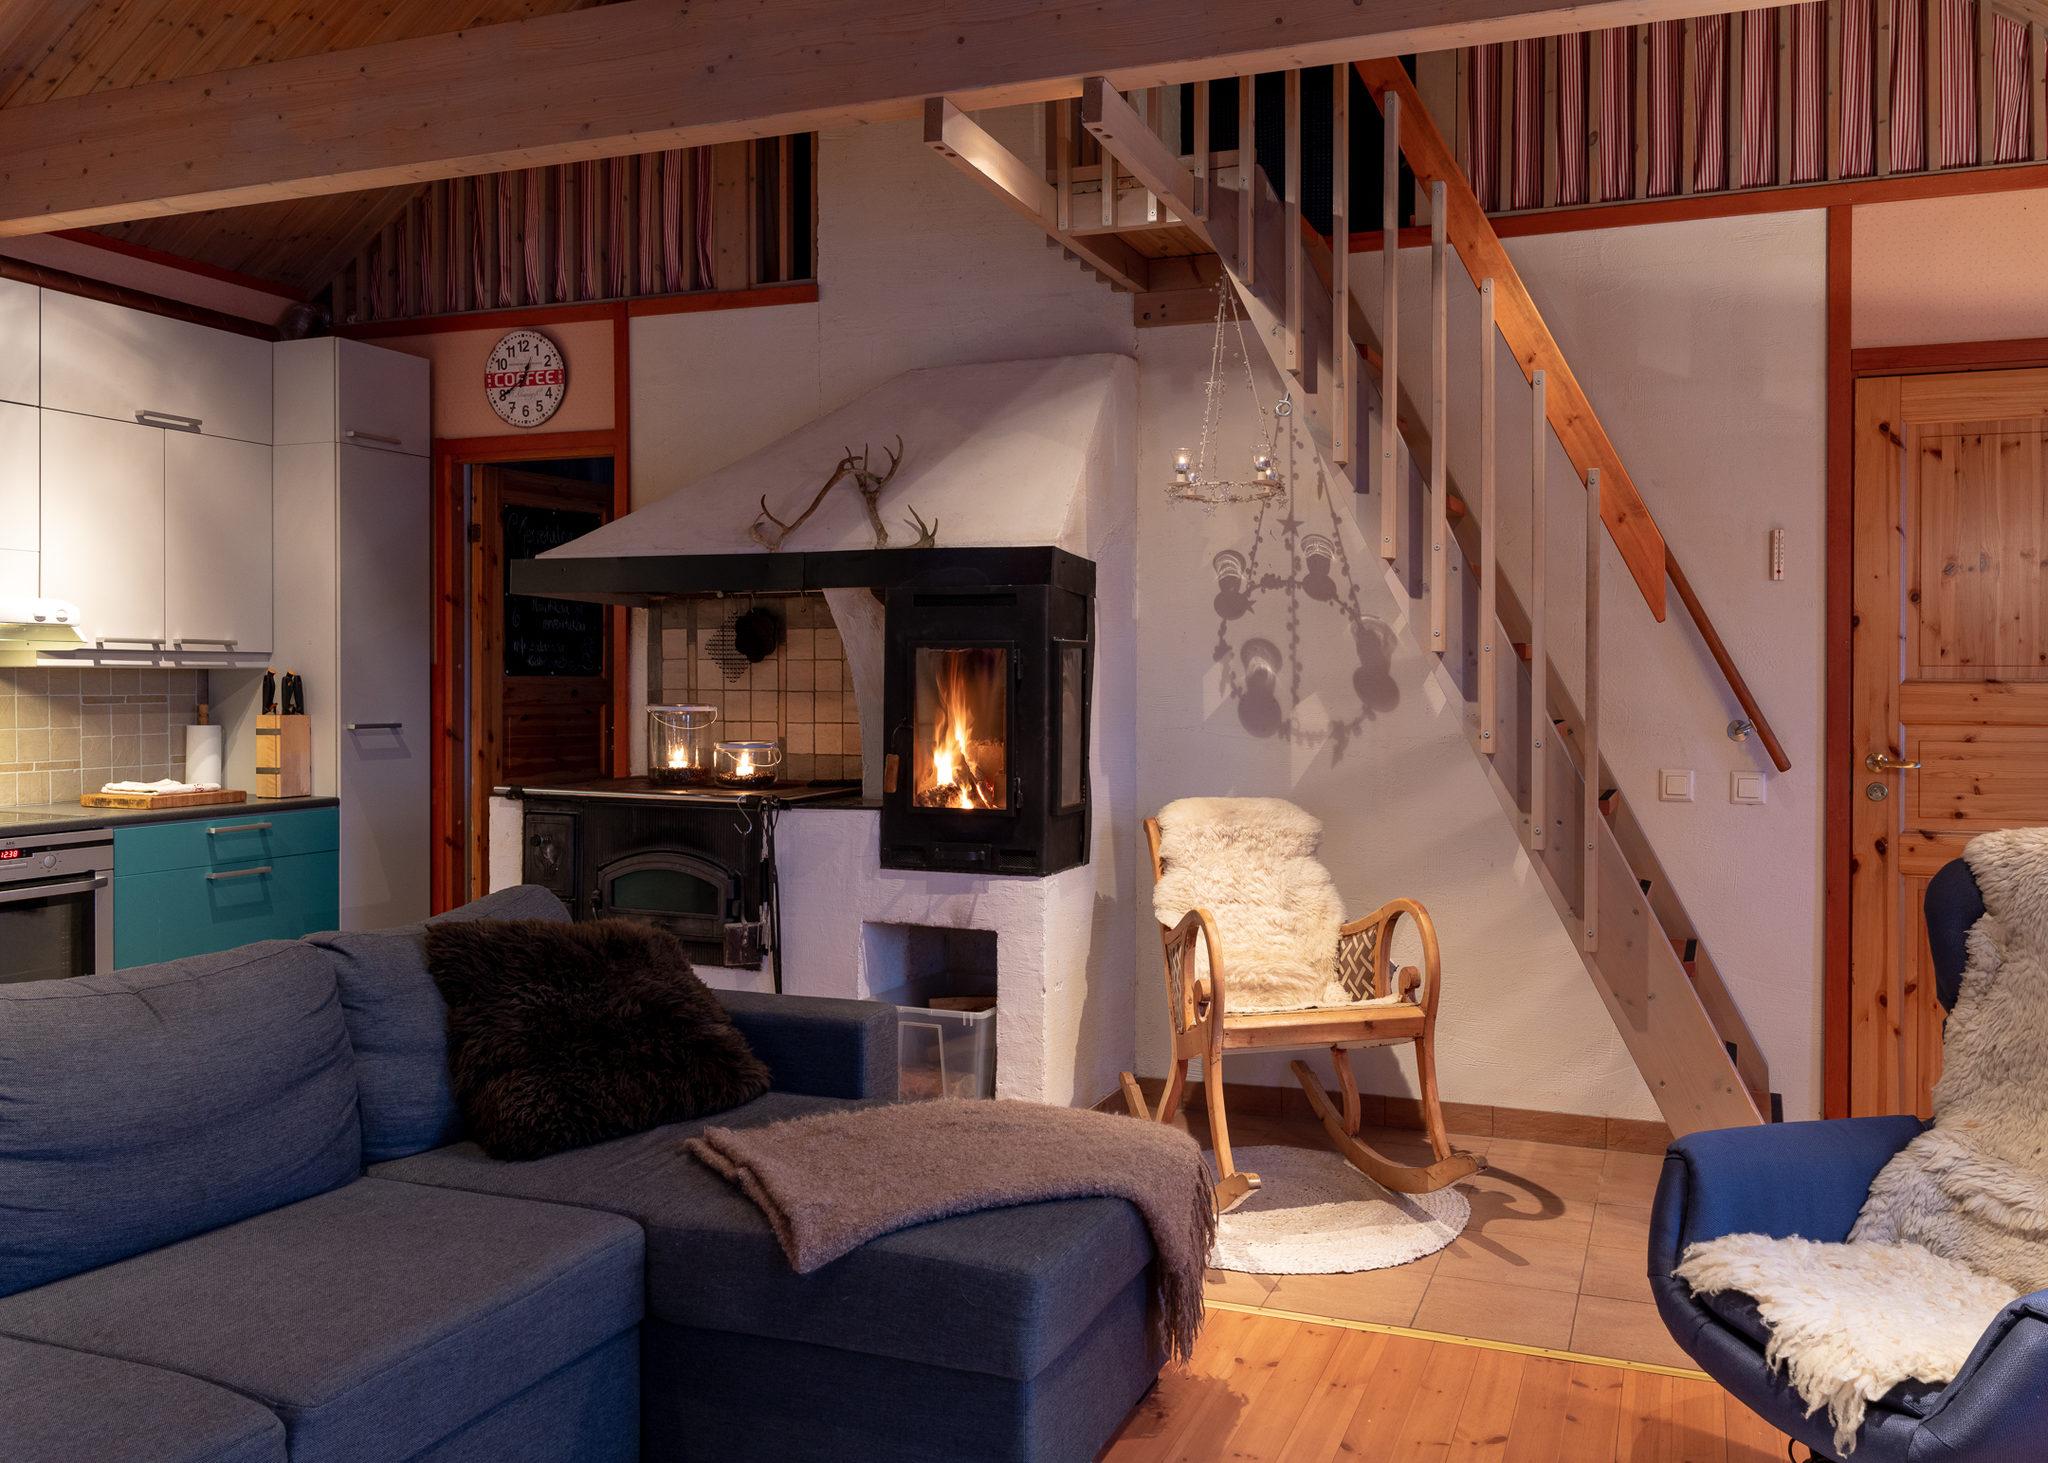 Accommodation of dreams in Villa Rauha